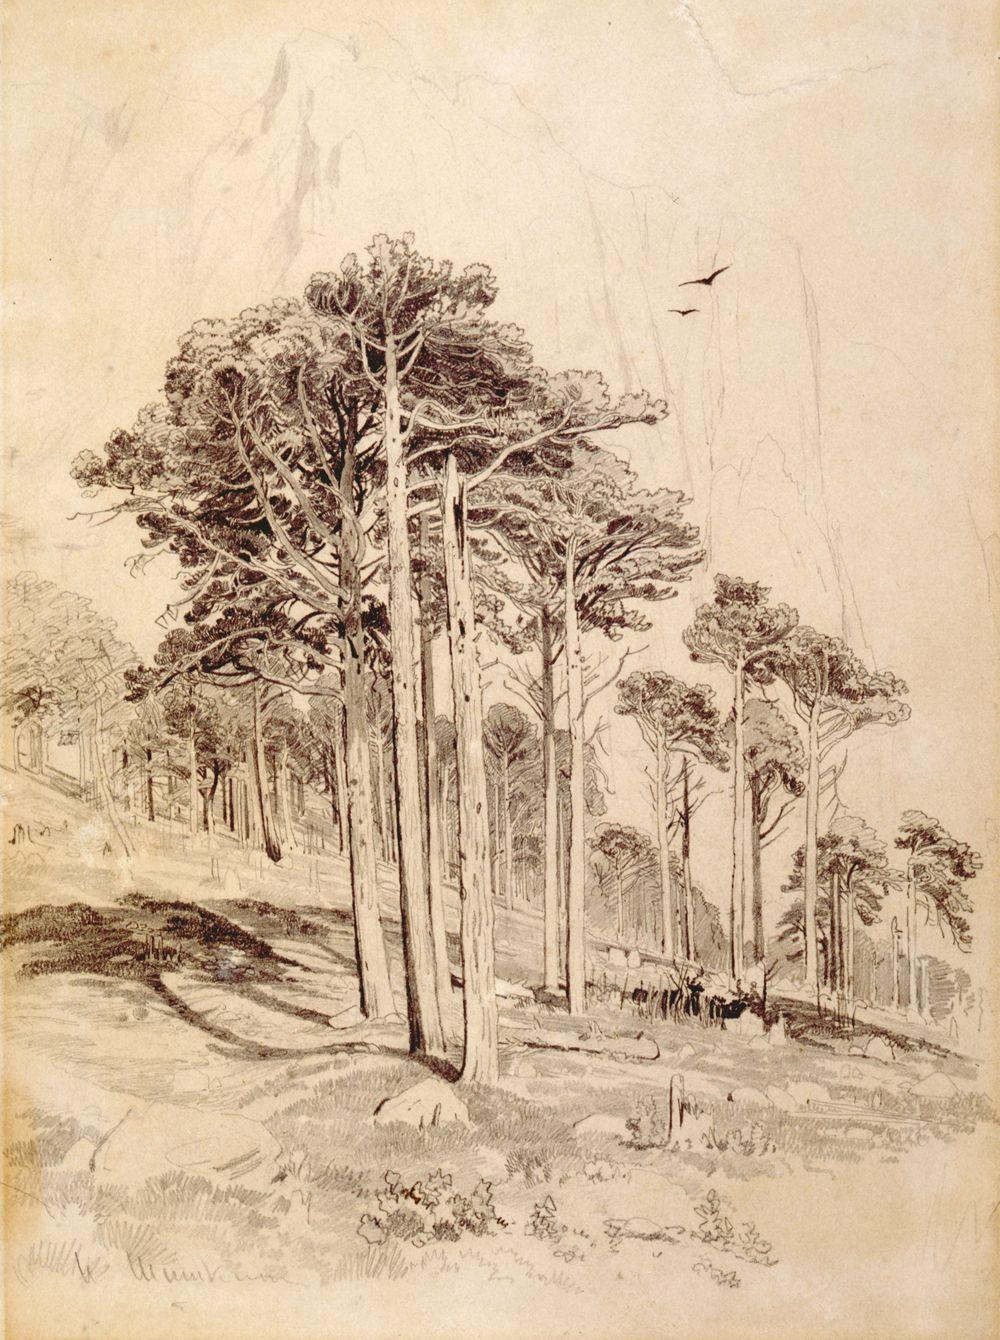 Baum Zeichnung Bleistift Inspirierend Ivan Shishkin Nature Pinterest Fotografieren